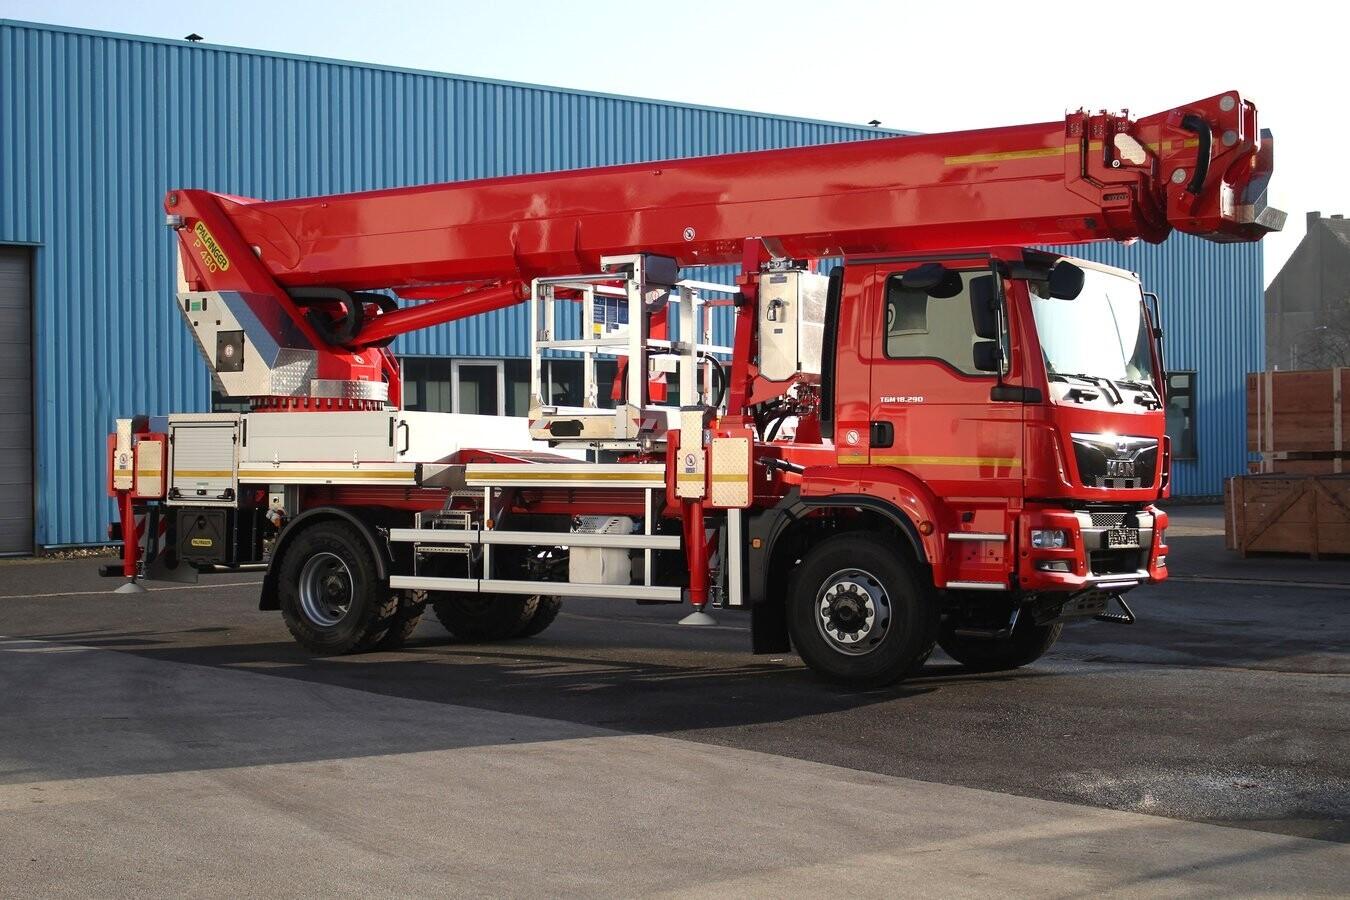 48m Truck Mounted Platform